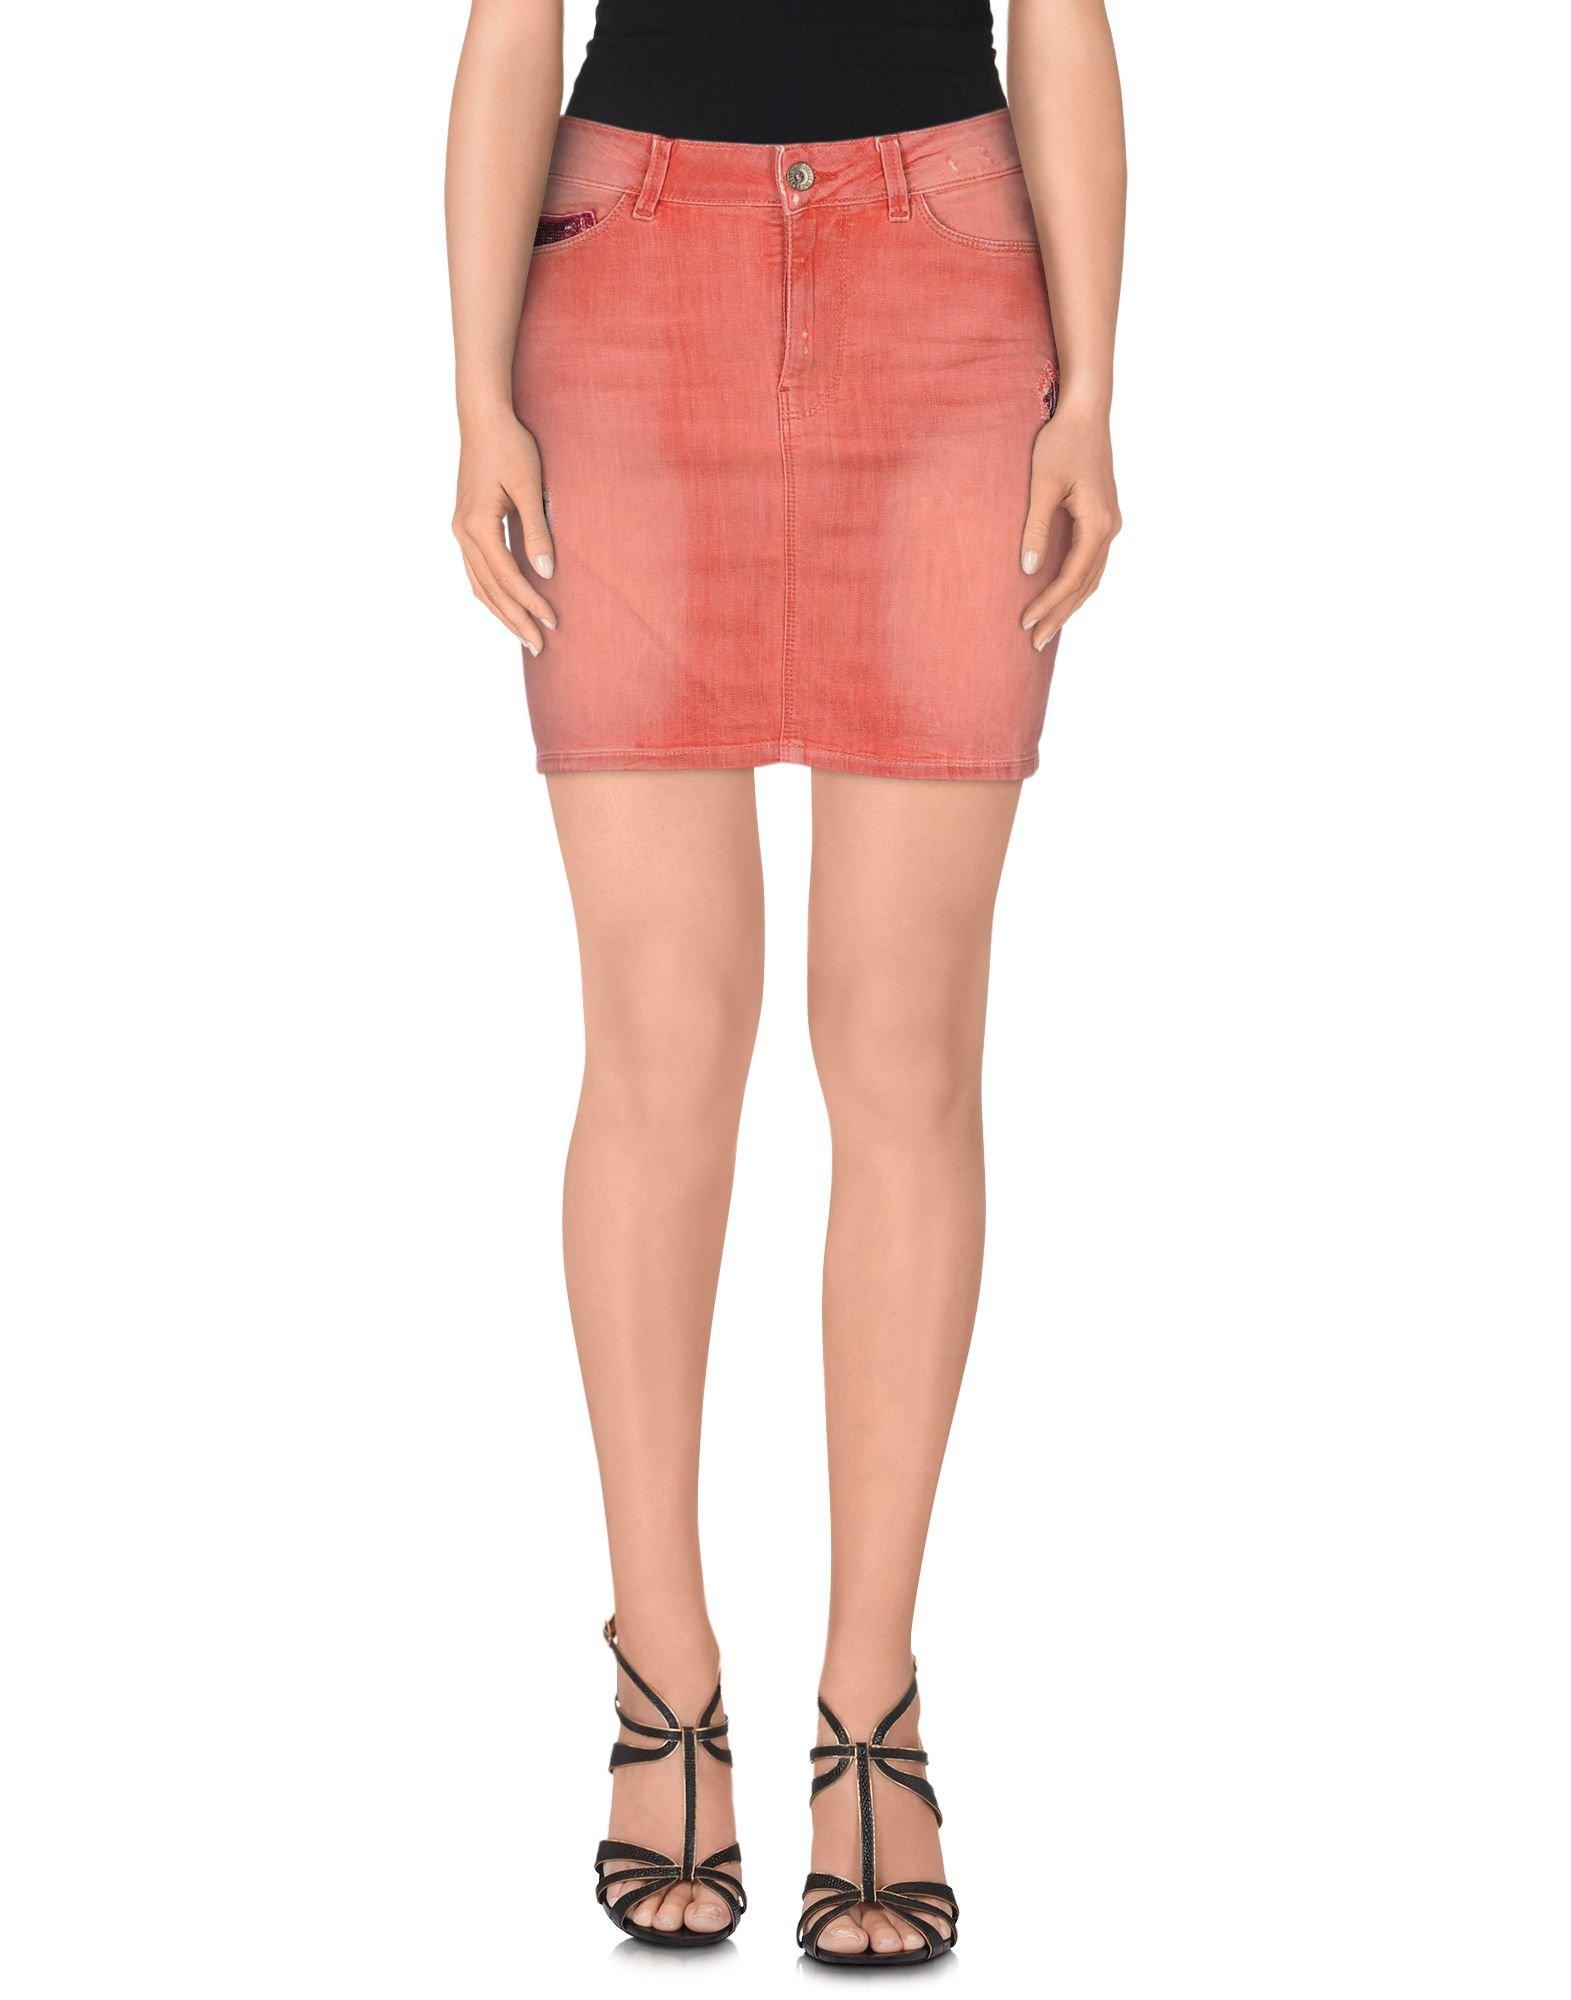 Pink Denim Skirt 89